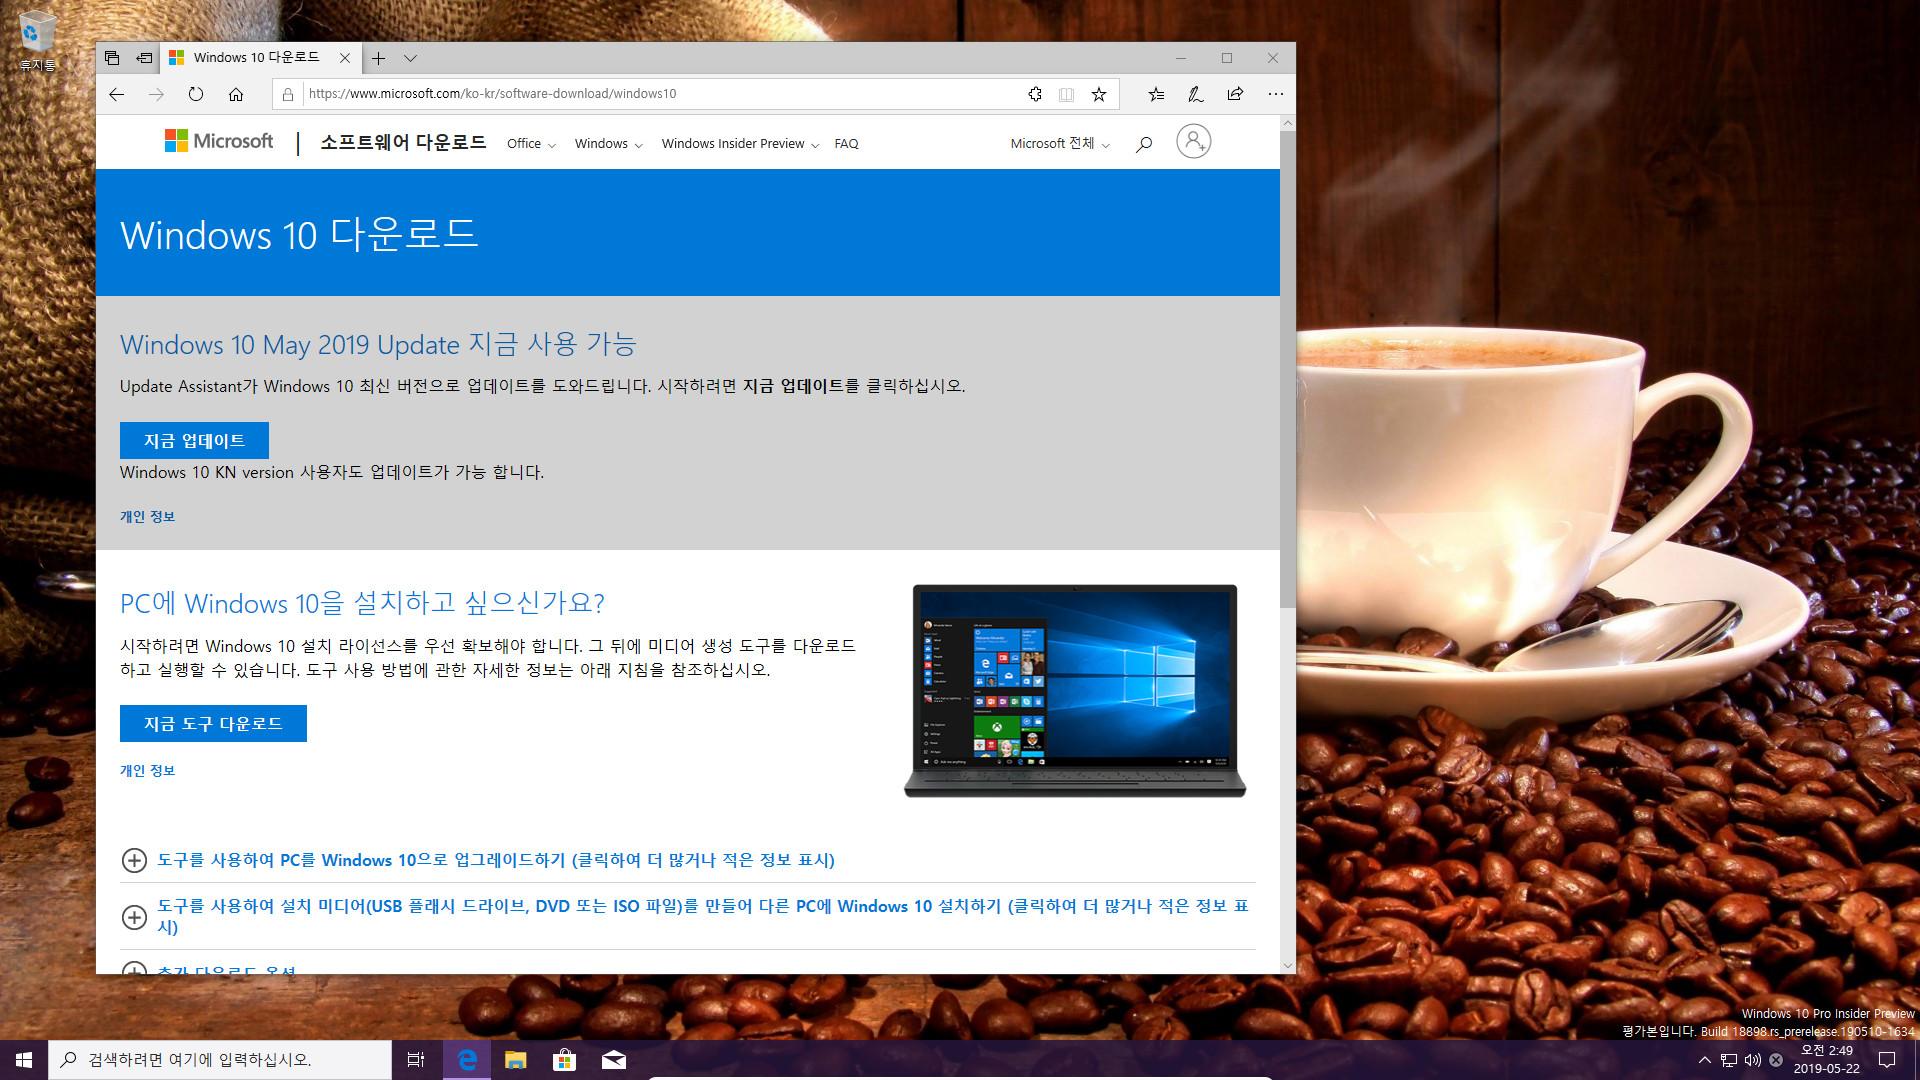 Windows 10 버전 1903 정식 출시됨 [코드네임 19H1, 빌드 18362, Windows 10 May 2019 Update] 한국시간으로 2019년 5월 22일 오전 2시 2019-05-22_024957.jpg